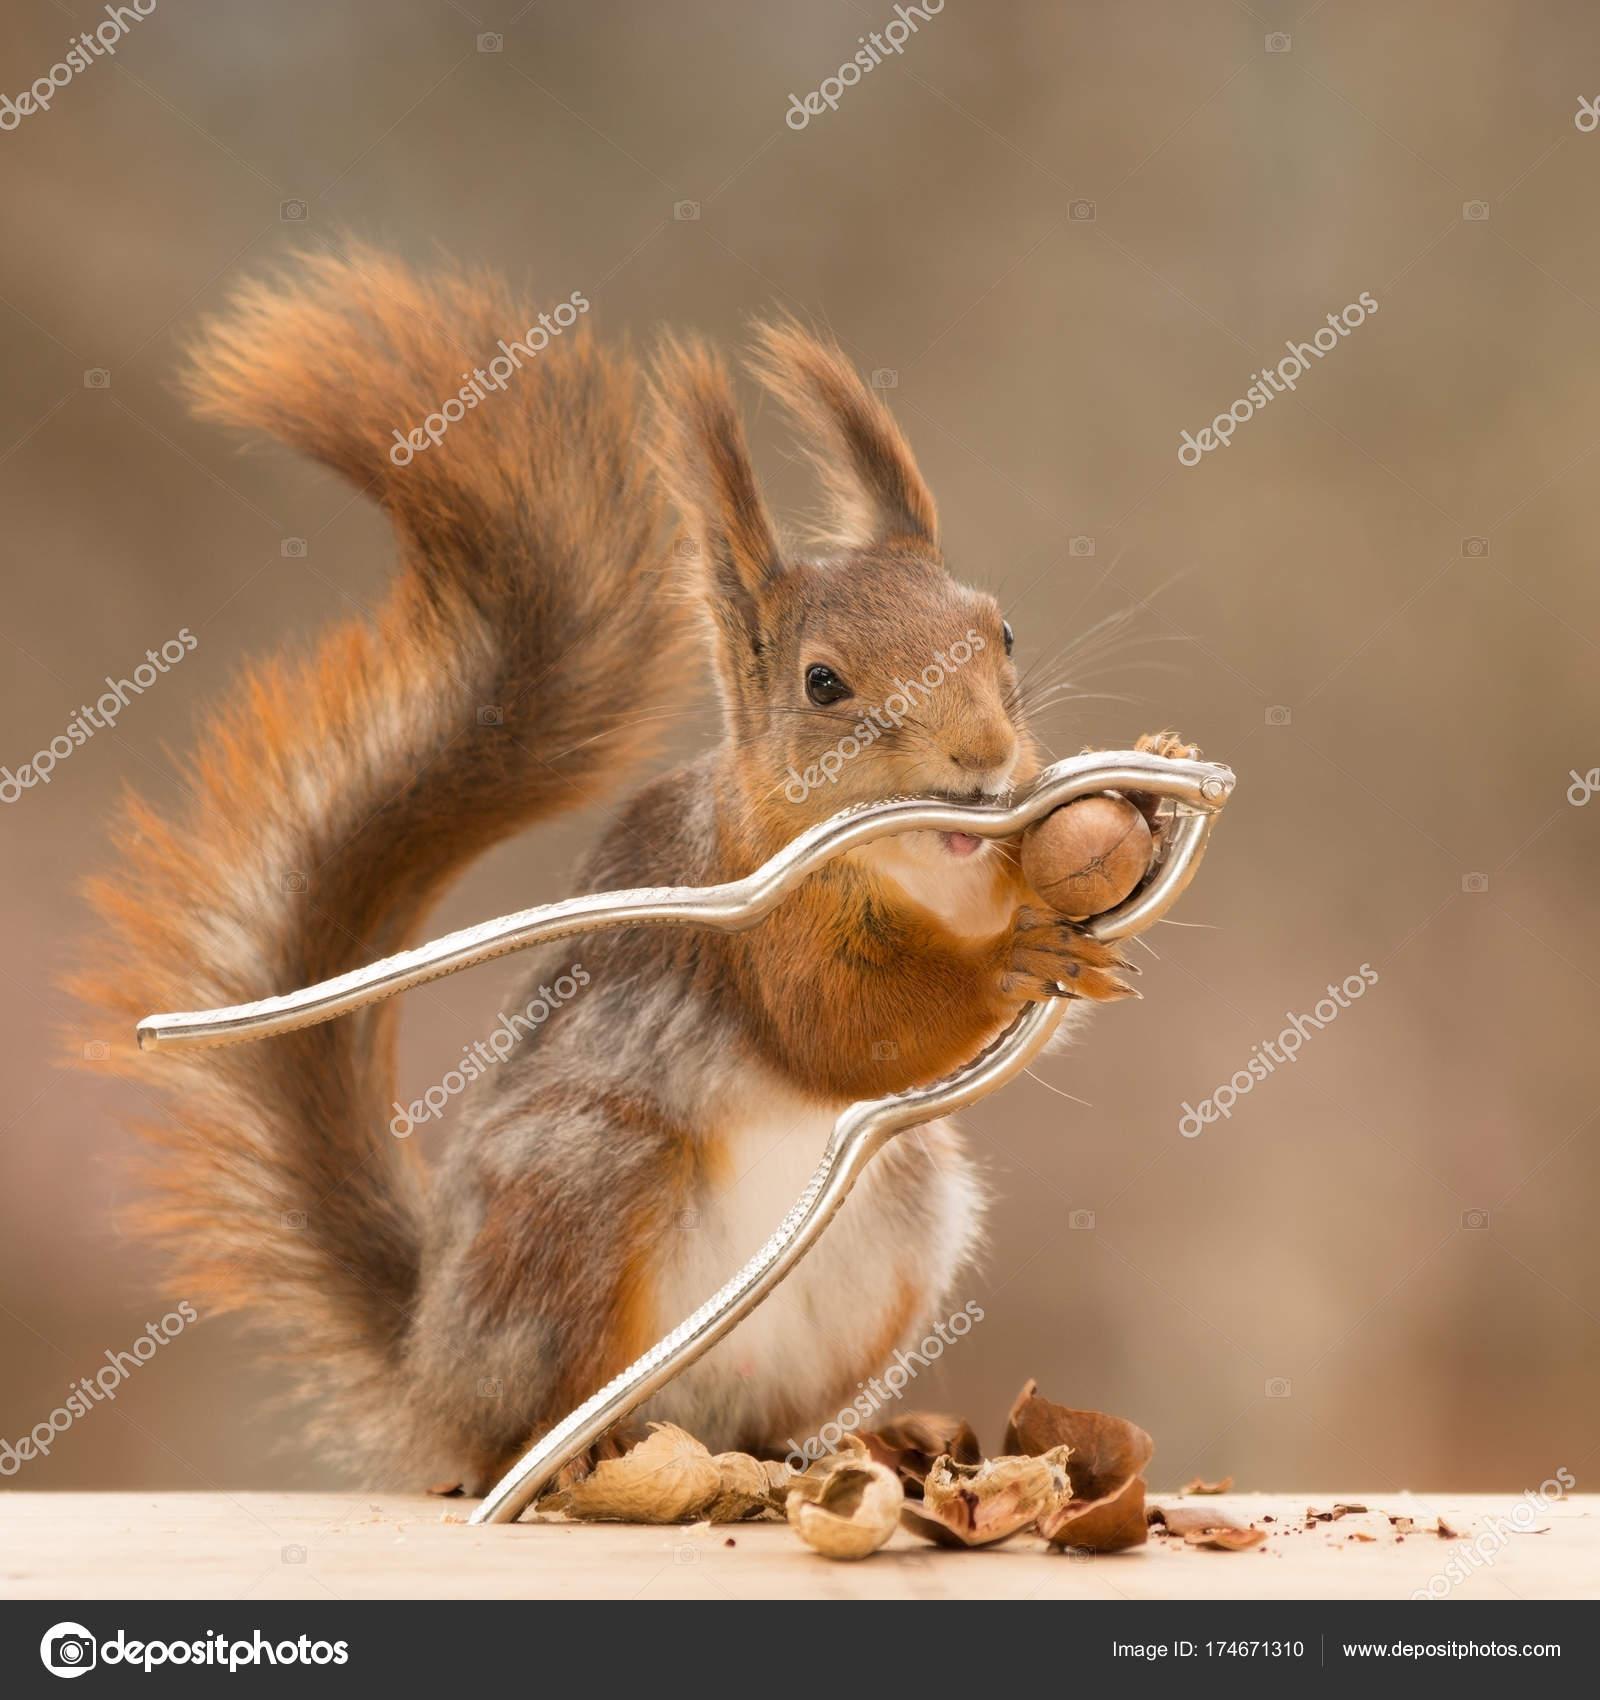 nutcracker with a nut in mouth — Stock Photo © geertweggen@yahoo.com ...